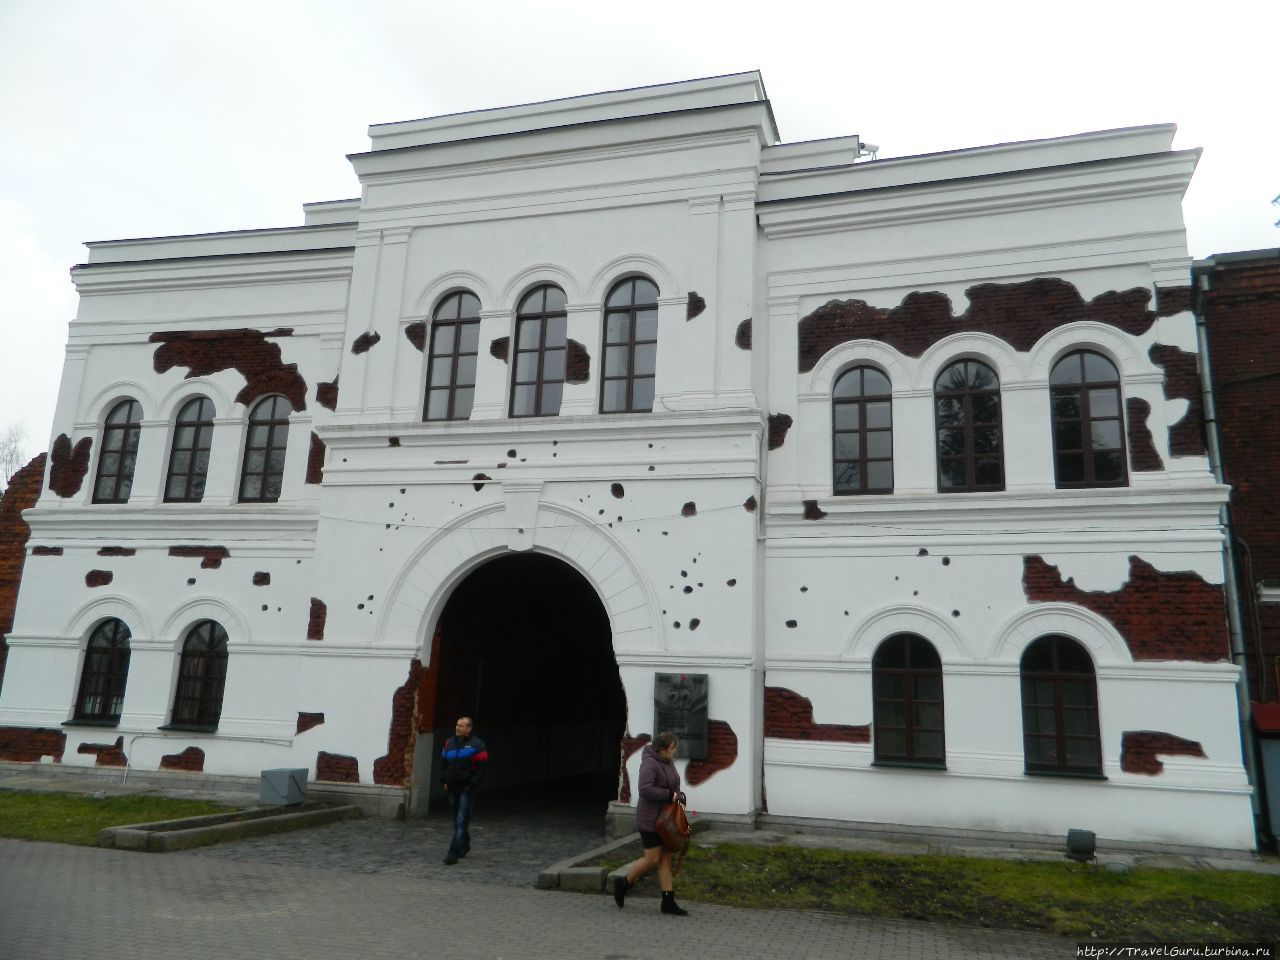 Брест. Западный форпост Беларуси